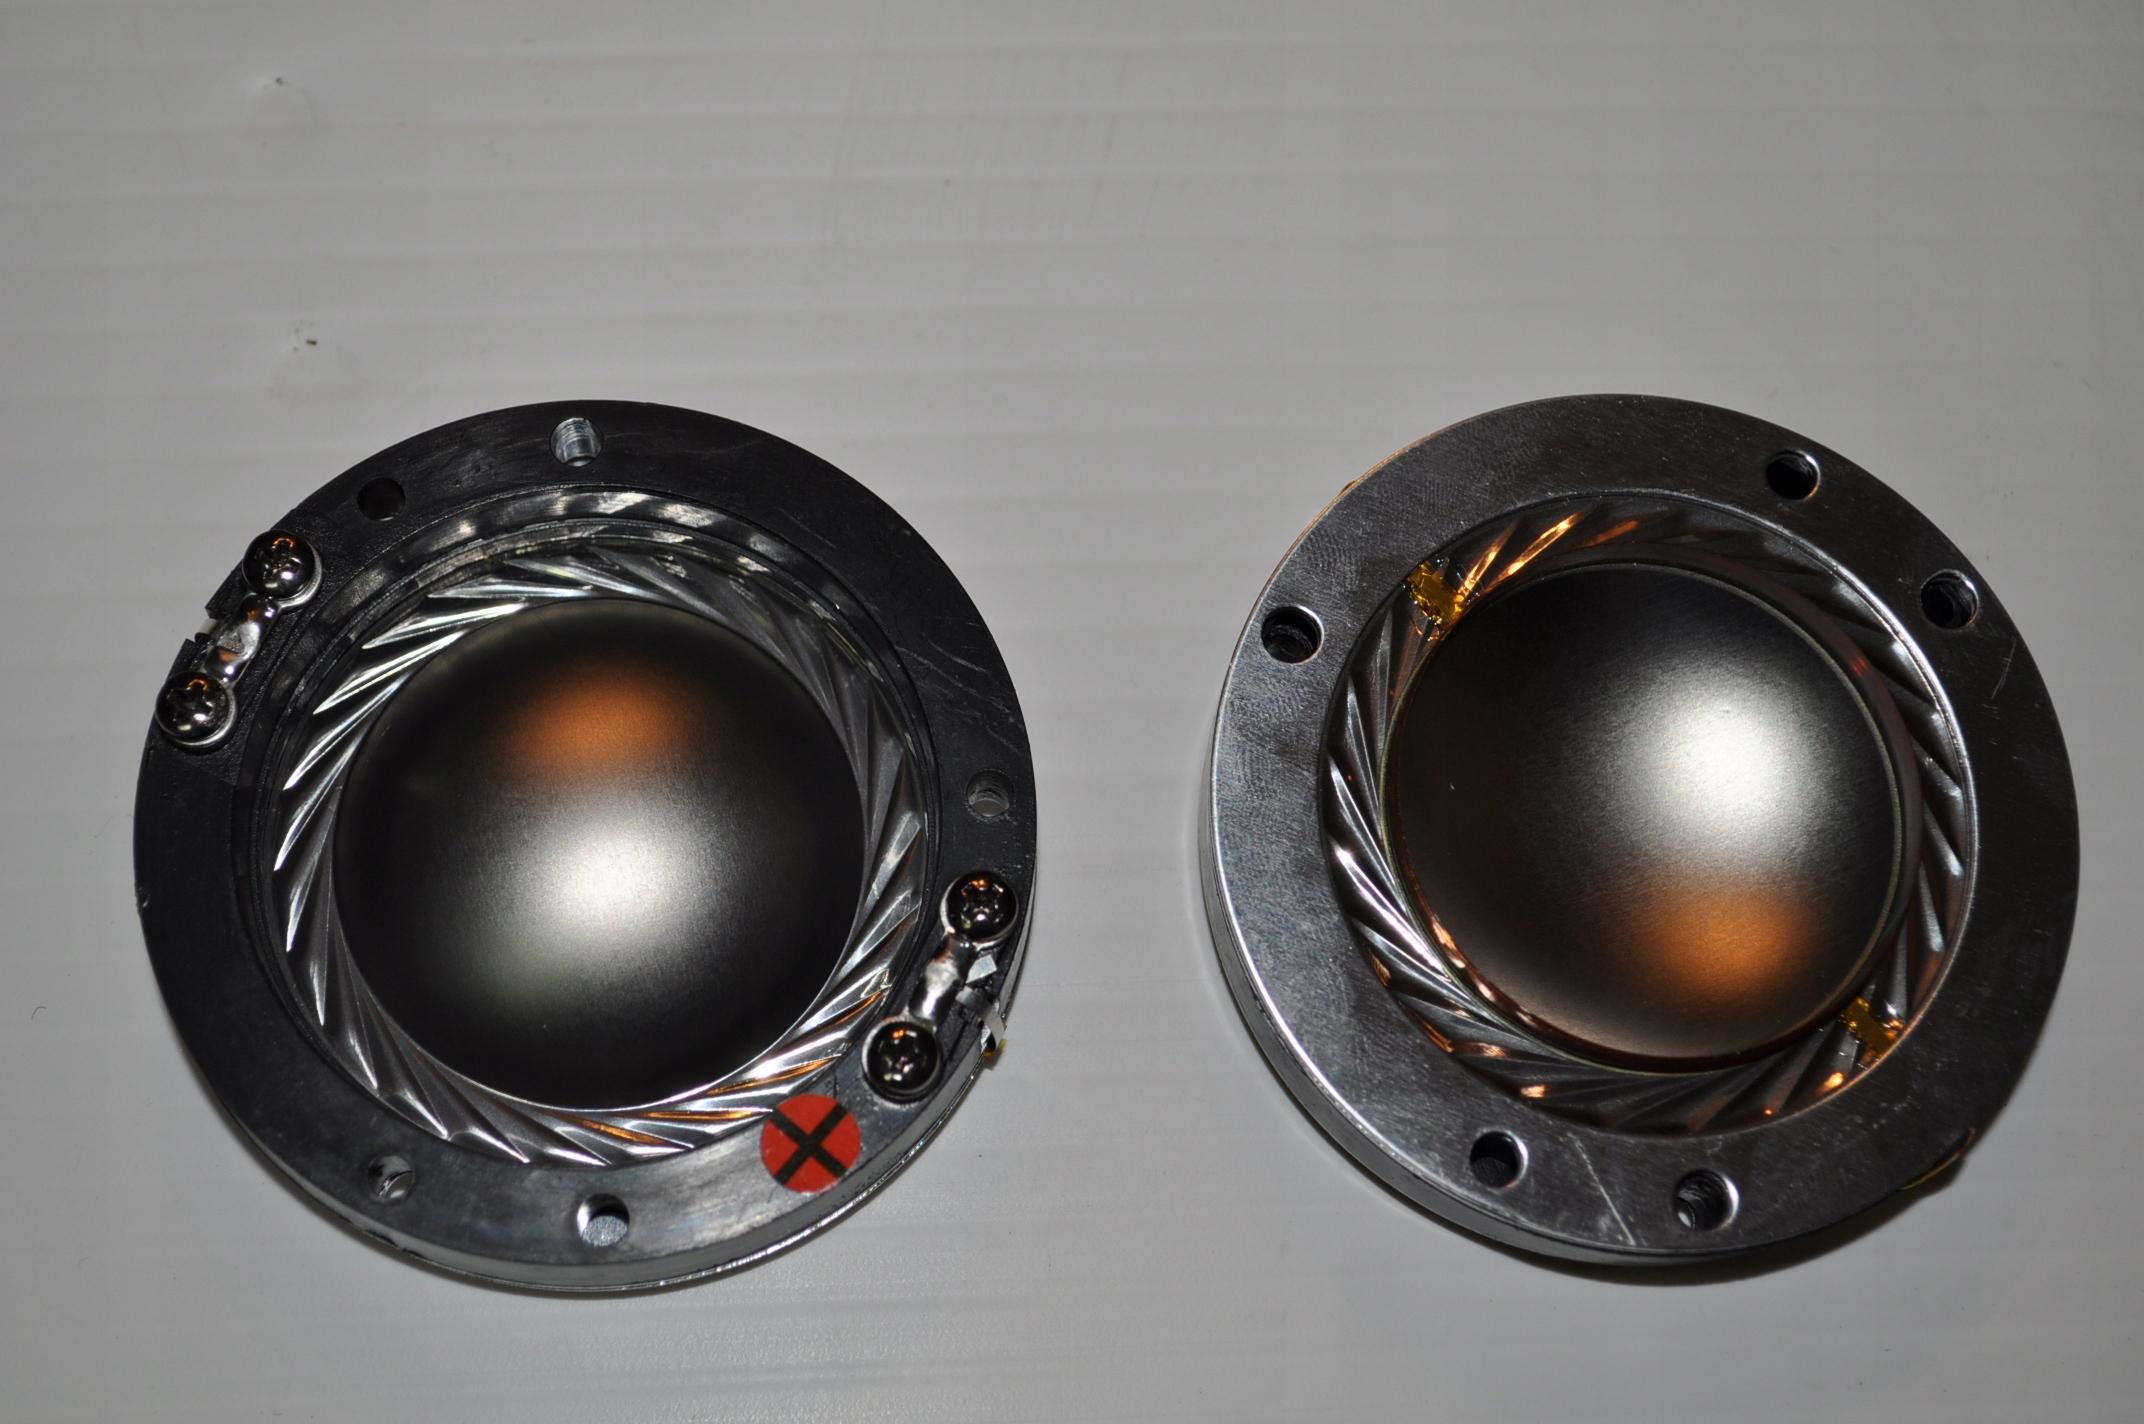 Cievka, Dome, Membránka Laná HT150 34.4mm